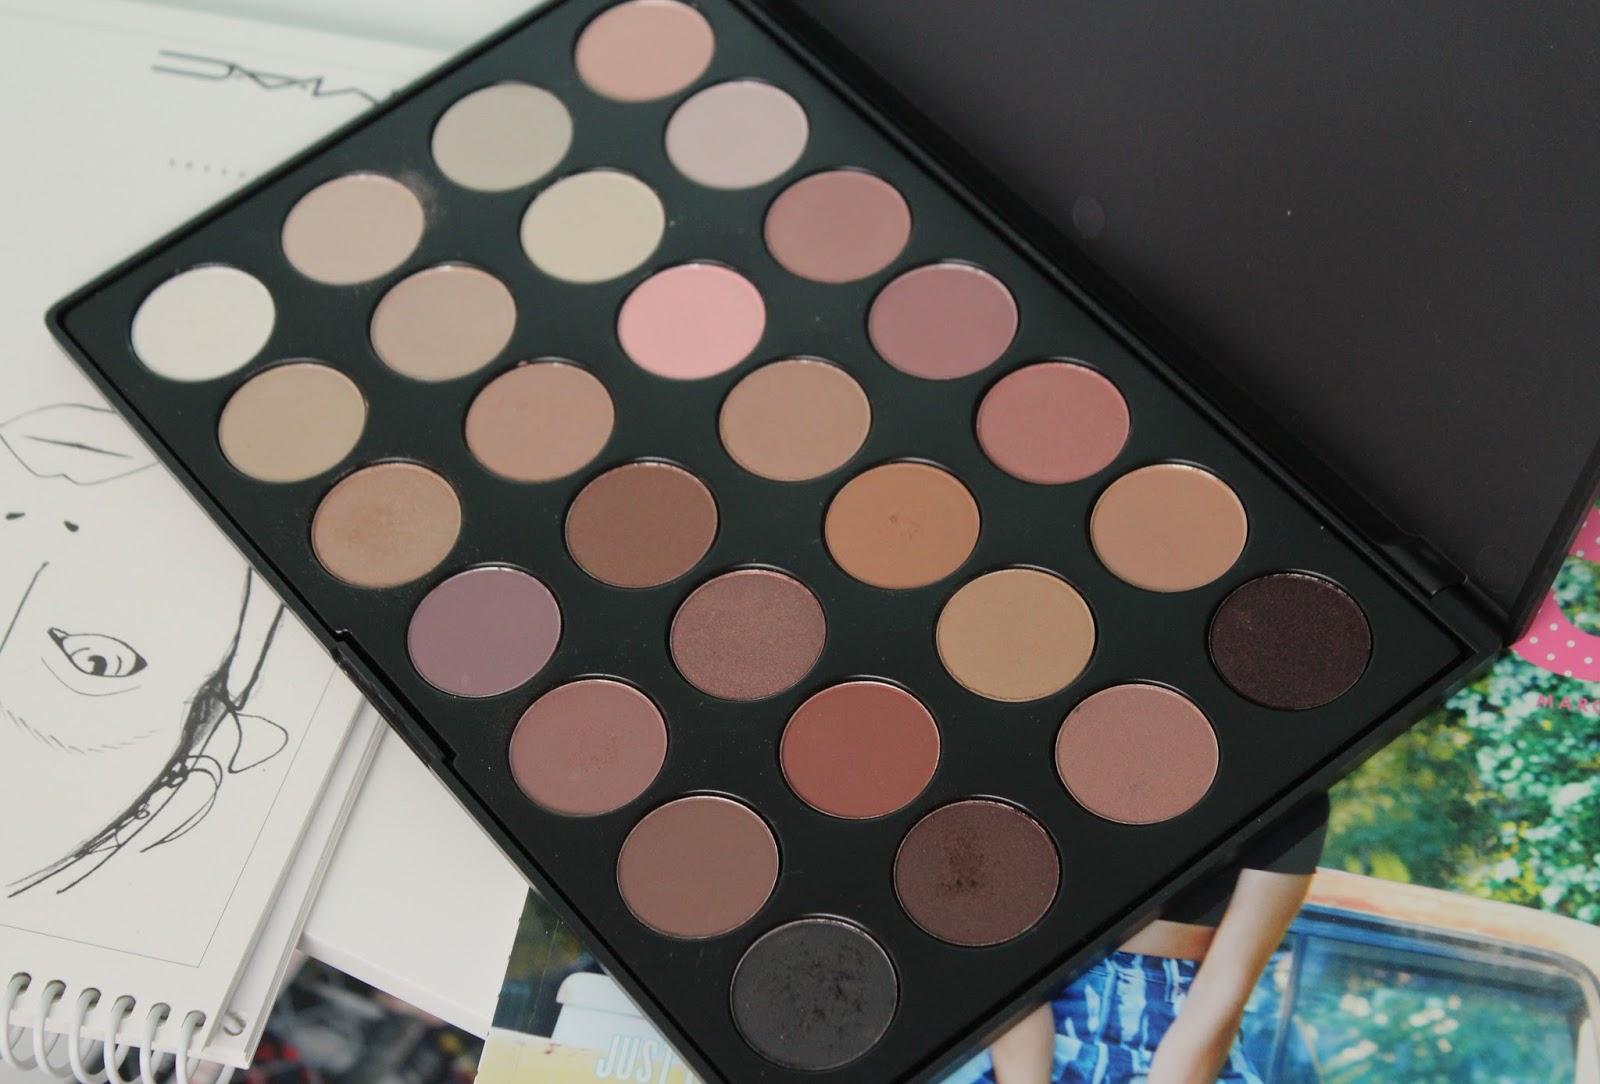 Beauy Steal Zoeva Nude Eyeshadow Palette Lily Pebbles